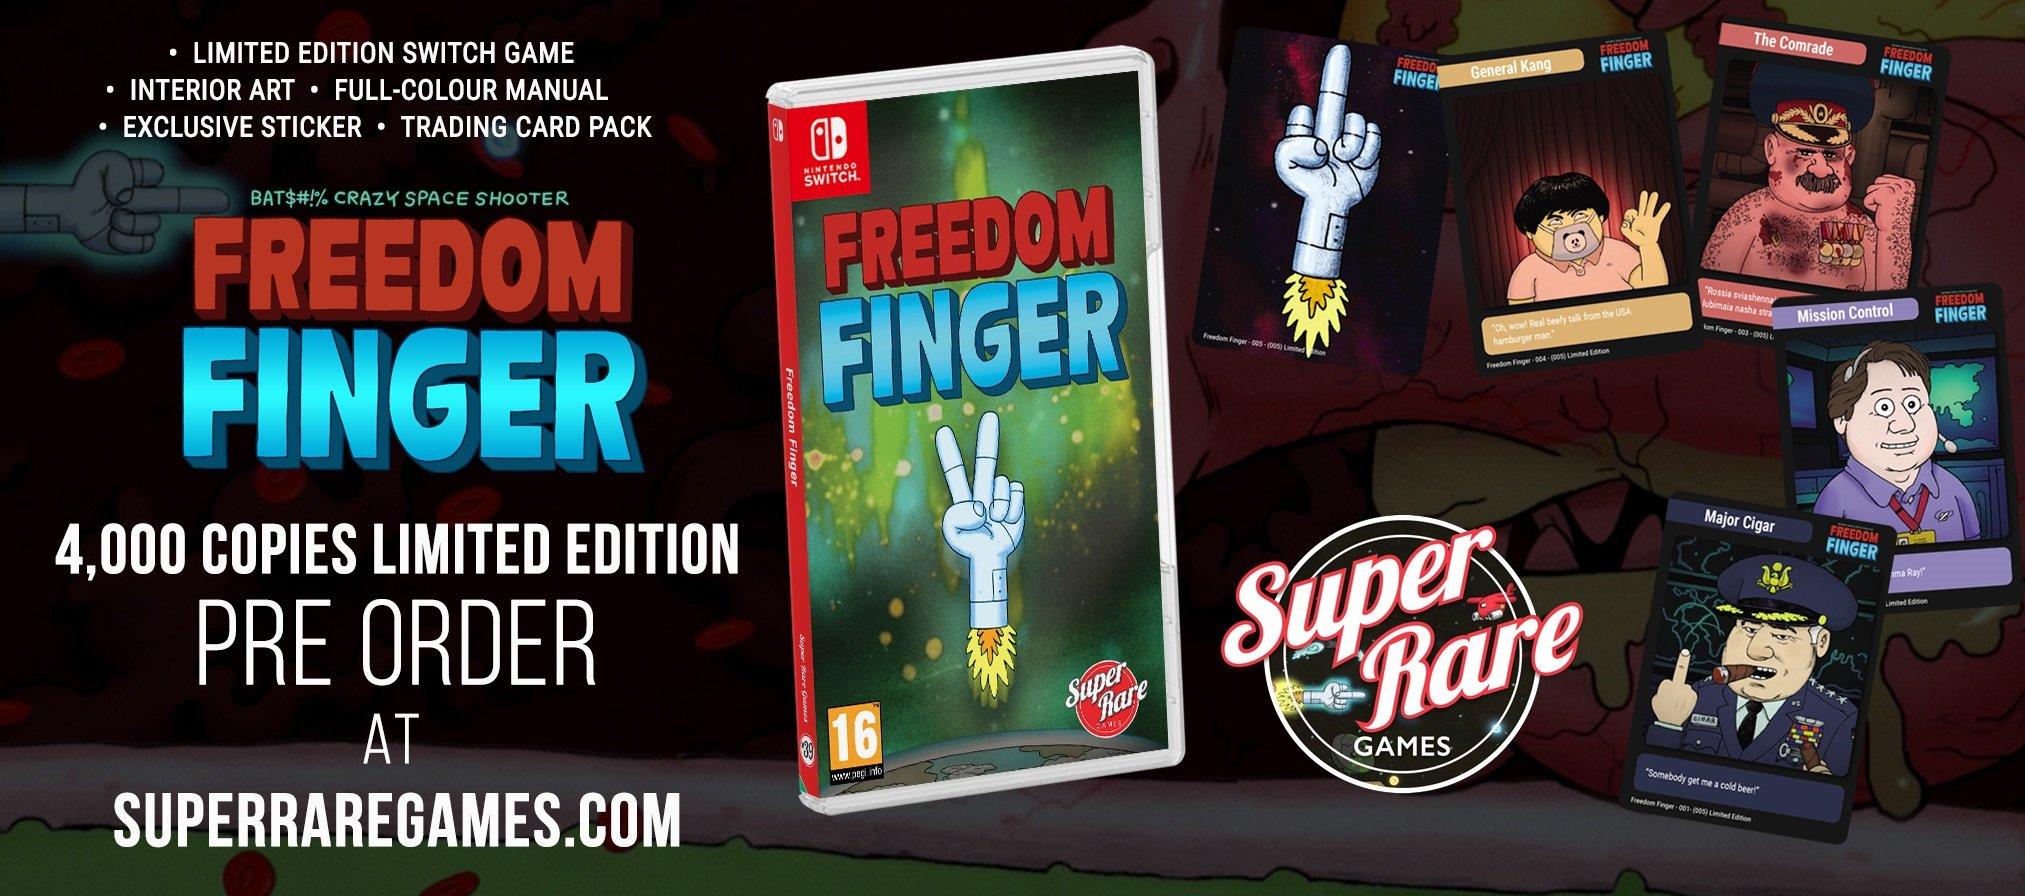 Contest Freedom Finger Super Rare Games win Switch